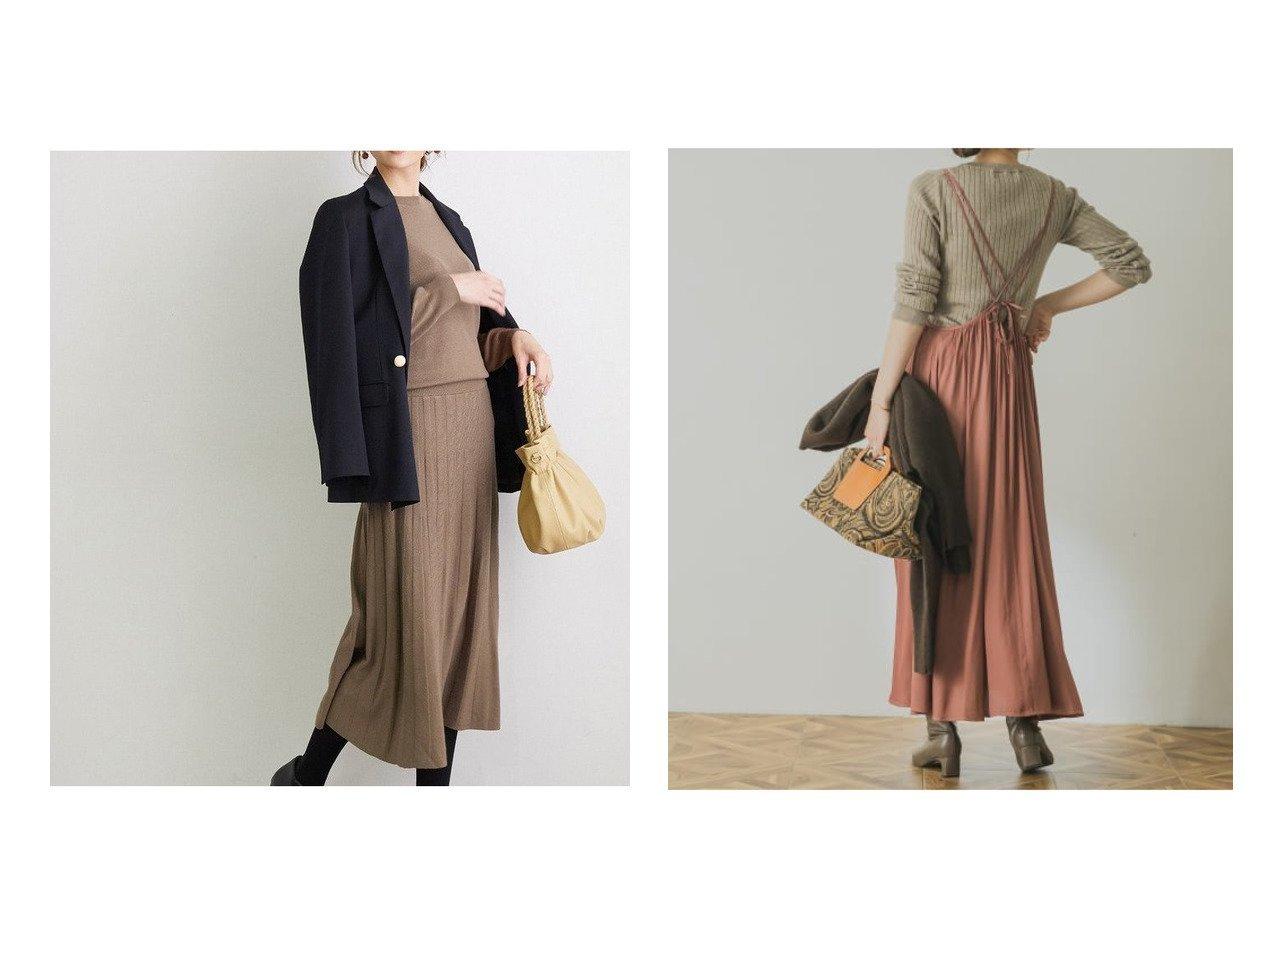 【Rope Picnic/ロペピクニック】のクルーネックプリーツニットワンピース&【URBAN RESEARCH/アーバンリサーチ】のサテンギャザーキャミソールワンピース ワンピース・ドレスのおすすめ!人気、レディースファッションの通販  おすすめで人気のファッション通販商品 インテリア・家具・キッズファッション・メンズファッション・レディースファッション・服の通販 founy(ファニー) https://founy.com/ ファッション Fashion レディース WOMEN ワンピース Dress ニットワンピース Knit Dresses ウォーム 秋 プリーツ ポケット 冬 Winter 春 カットソー キャミワンピース ギャザー スタンダード 人気 バランス ベーシック ミドル |ID:crp329100000005006